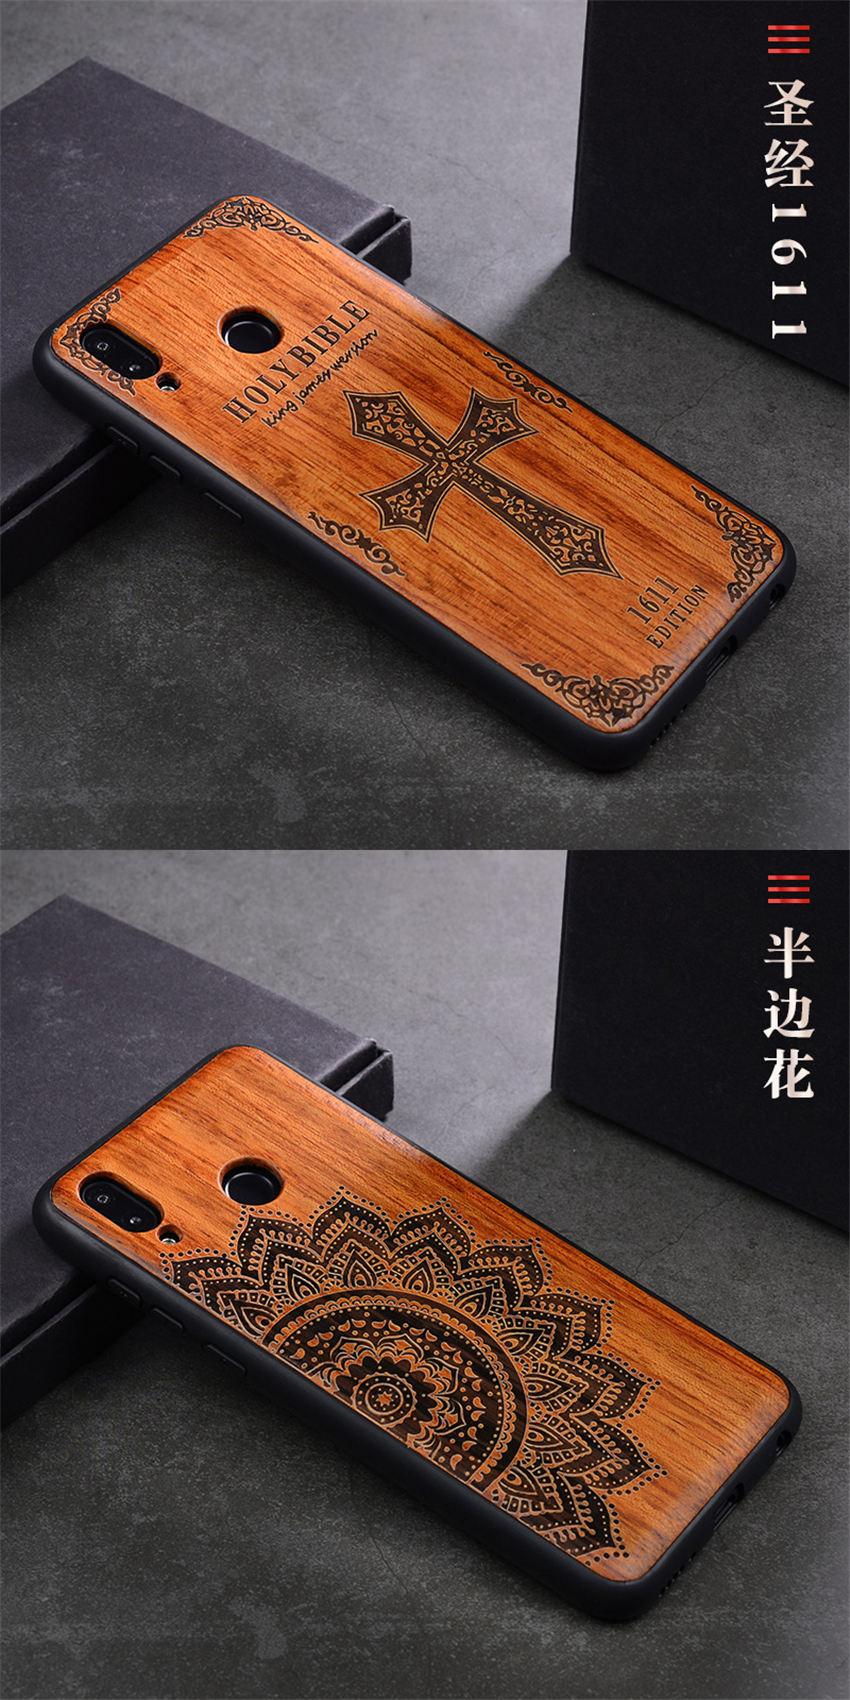 2018 New Huawei Honor 8x Case Slim Wood Back Cover TPU Bumper Case For Huawei Honor 8x Phone Cases Honor-8x (13)